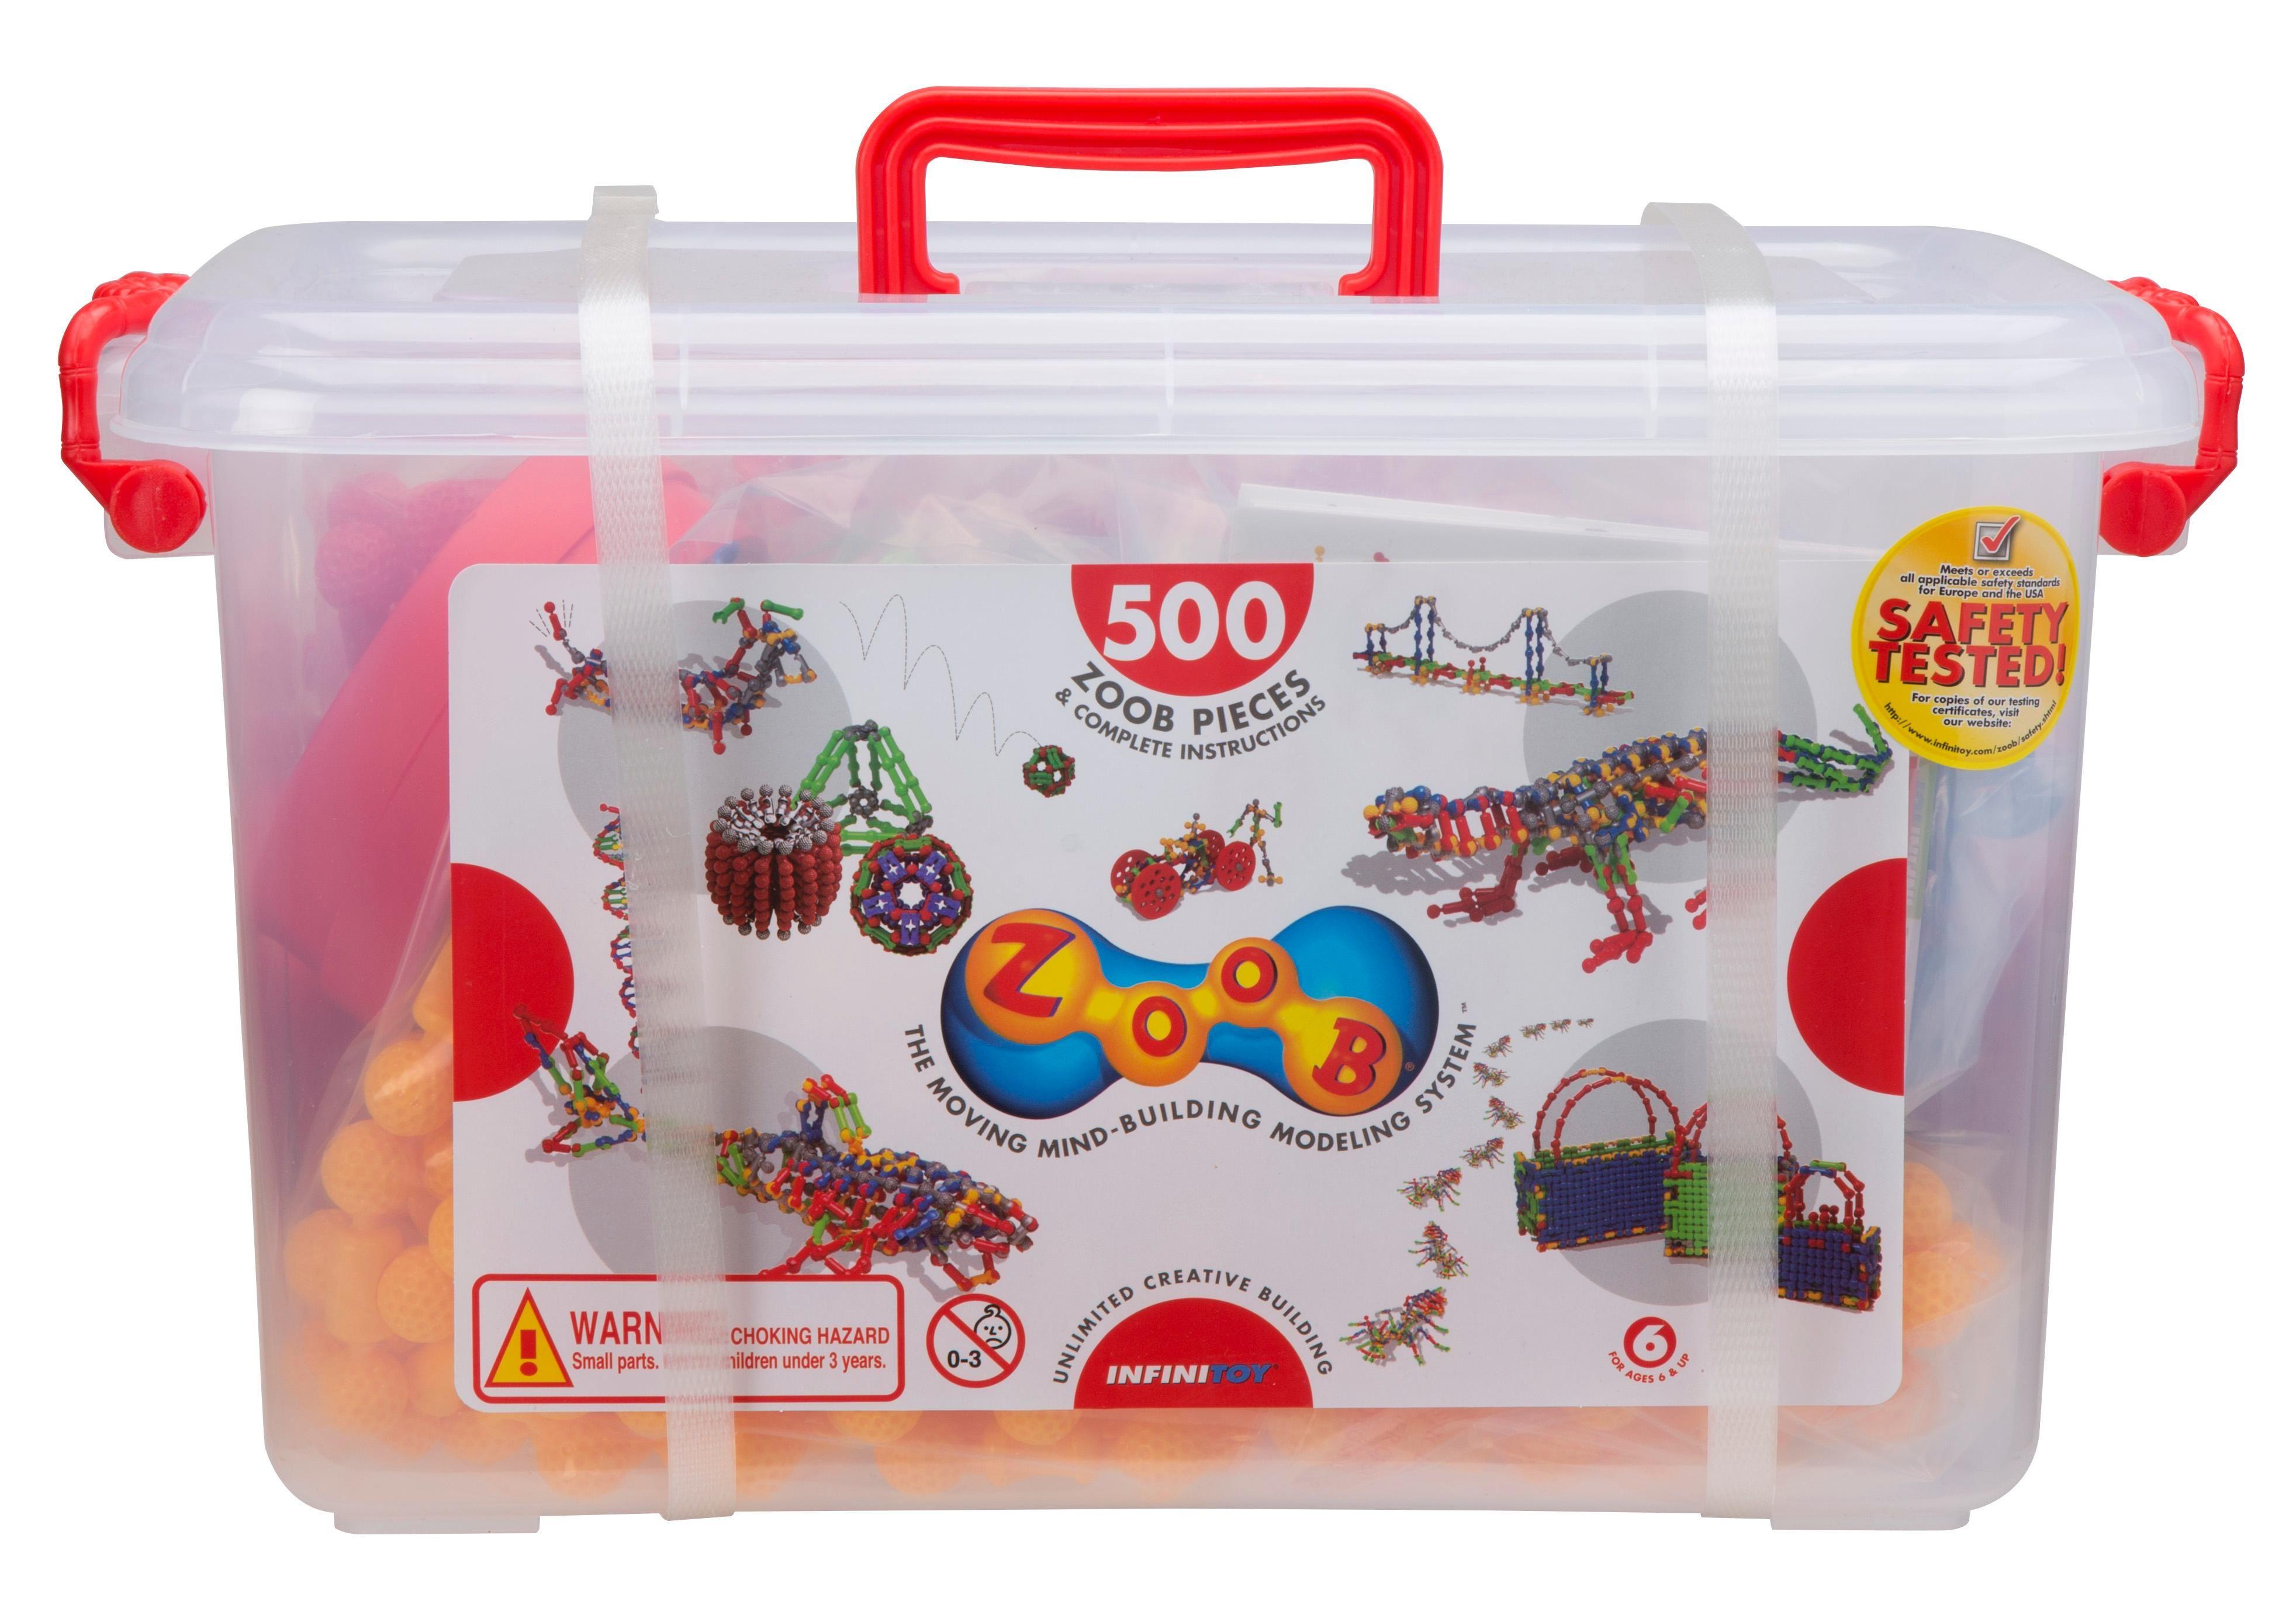 Amazon.com: ZOOB 500 Piece Building Set: Toys & Games